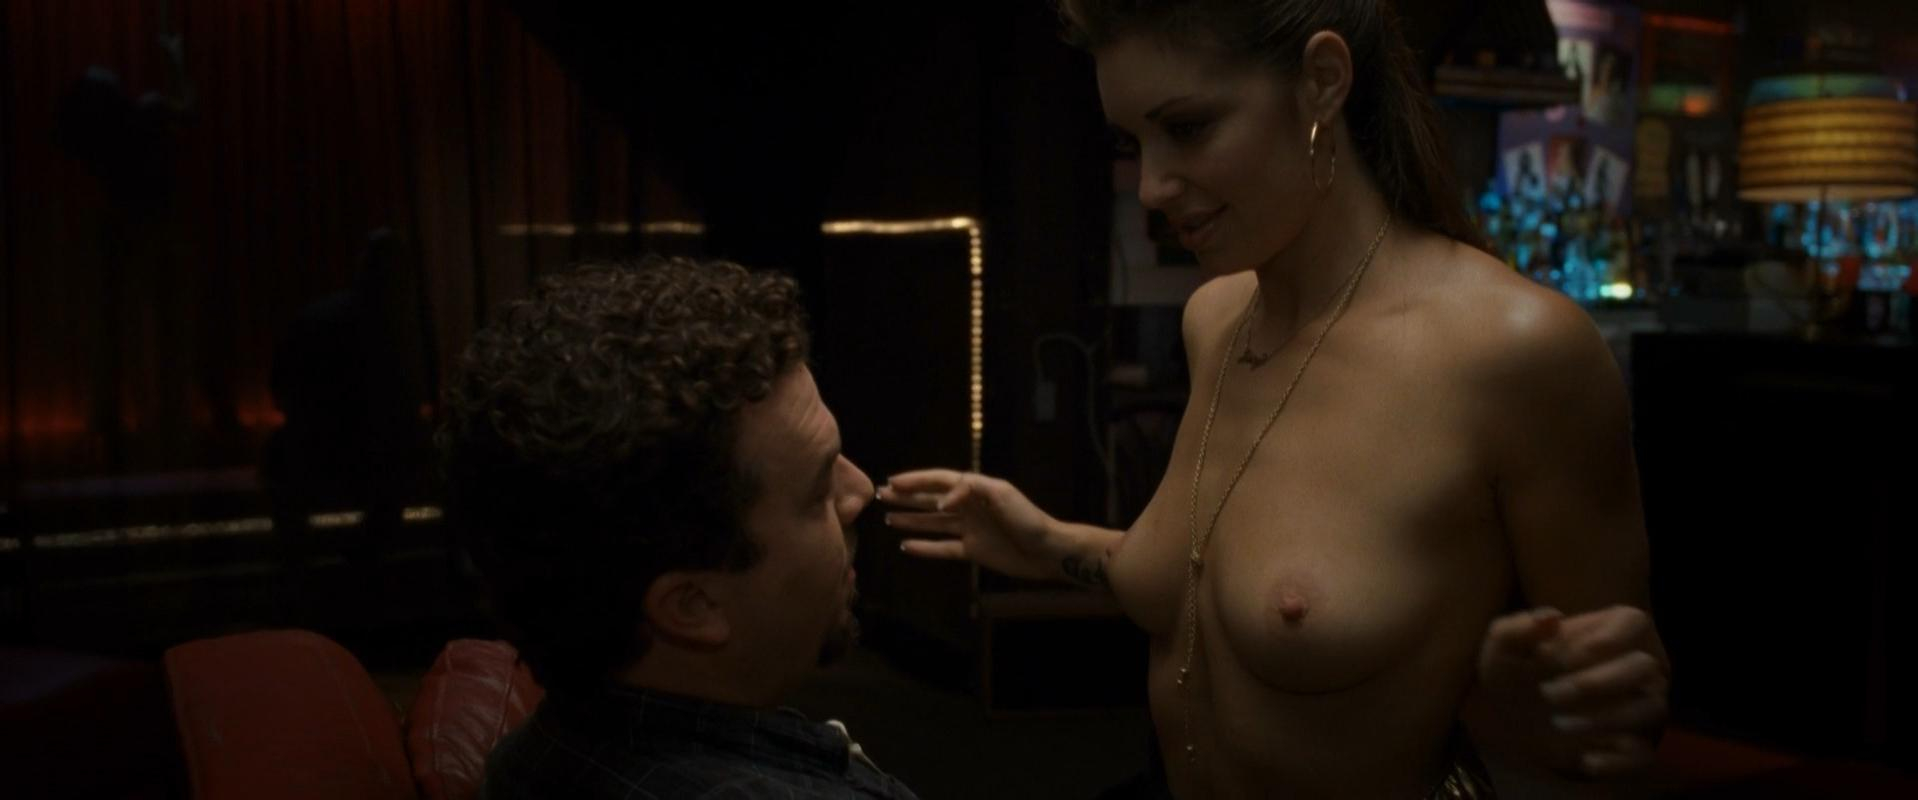 Bianca Kajlich nude - 30 Minutes or Less (2011)